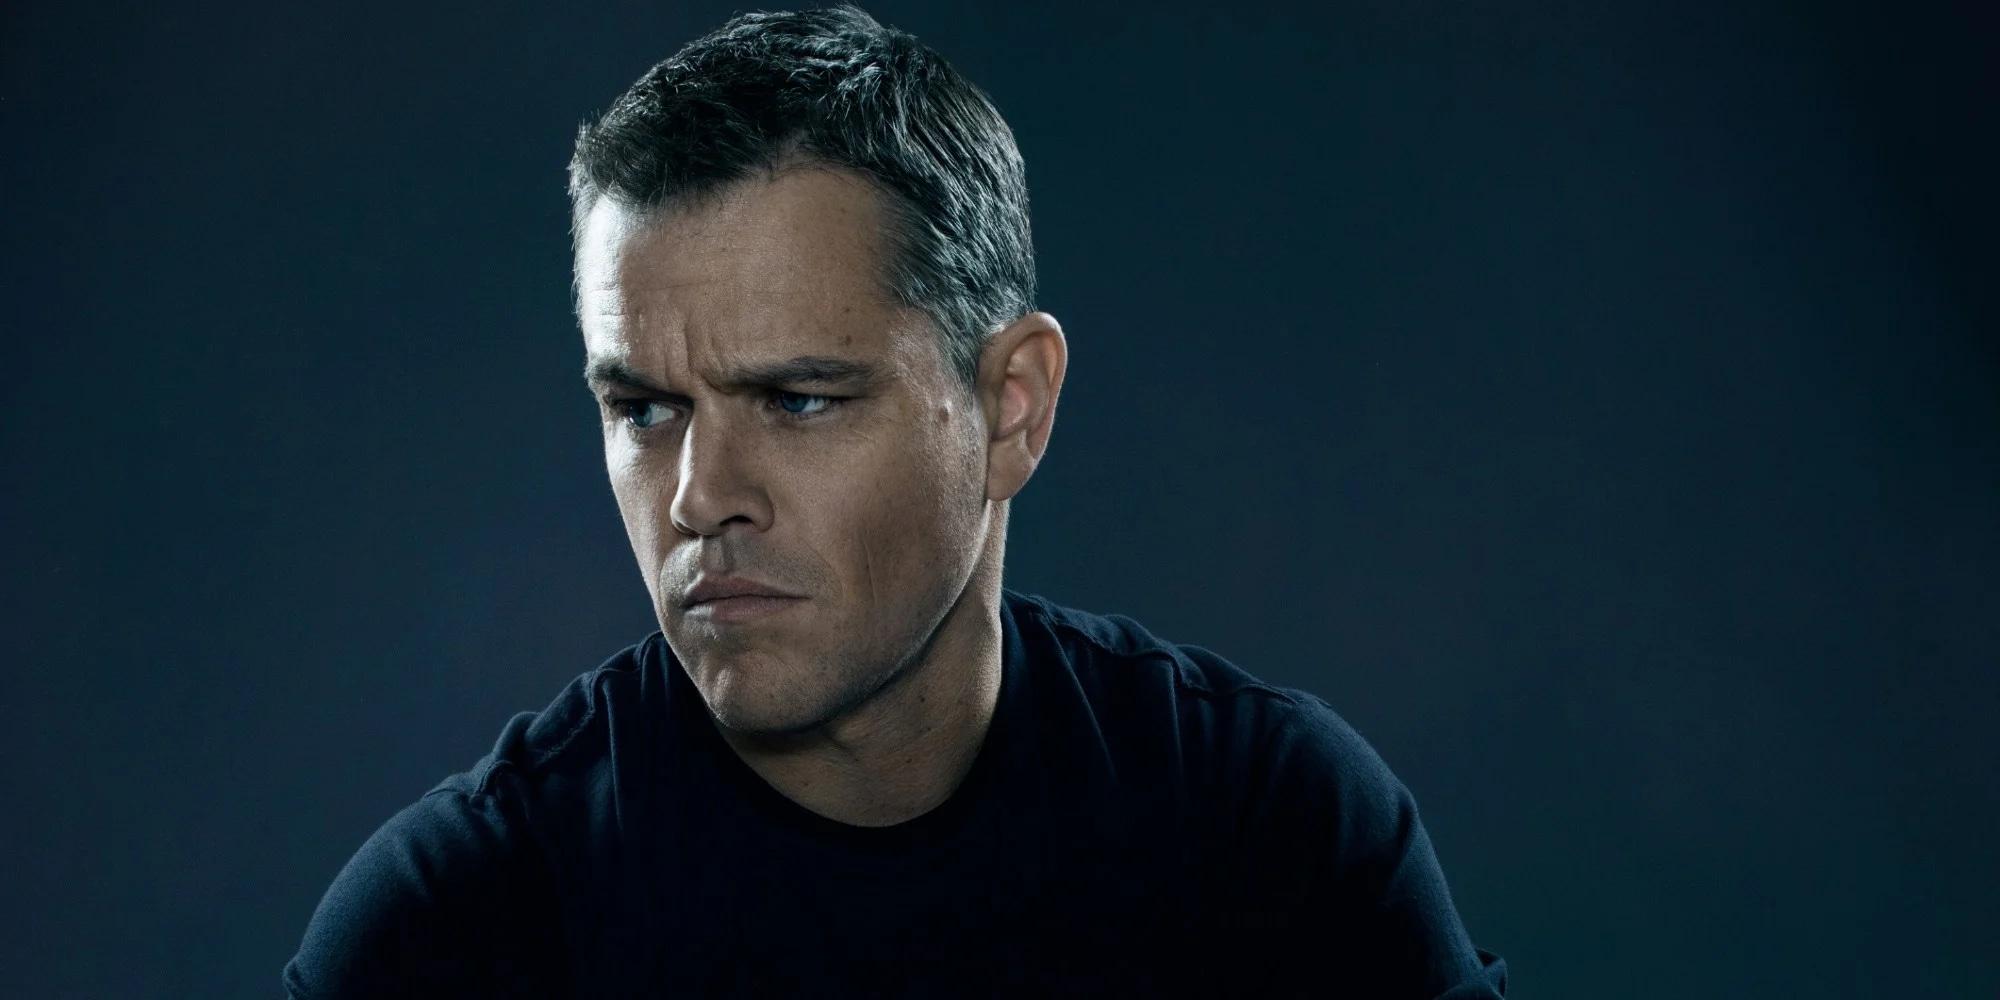 ¿Eres fan de Jason Bourne? Tenemos buenas noticias para ti